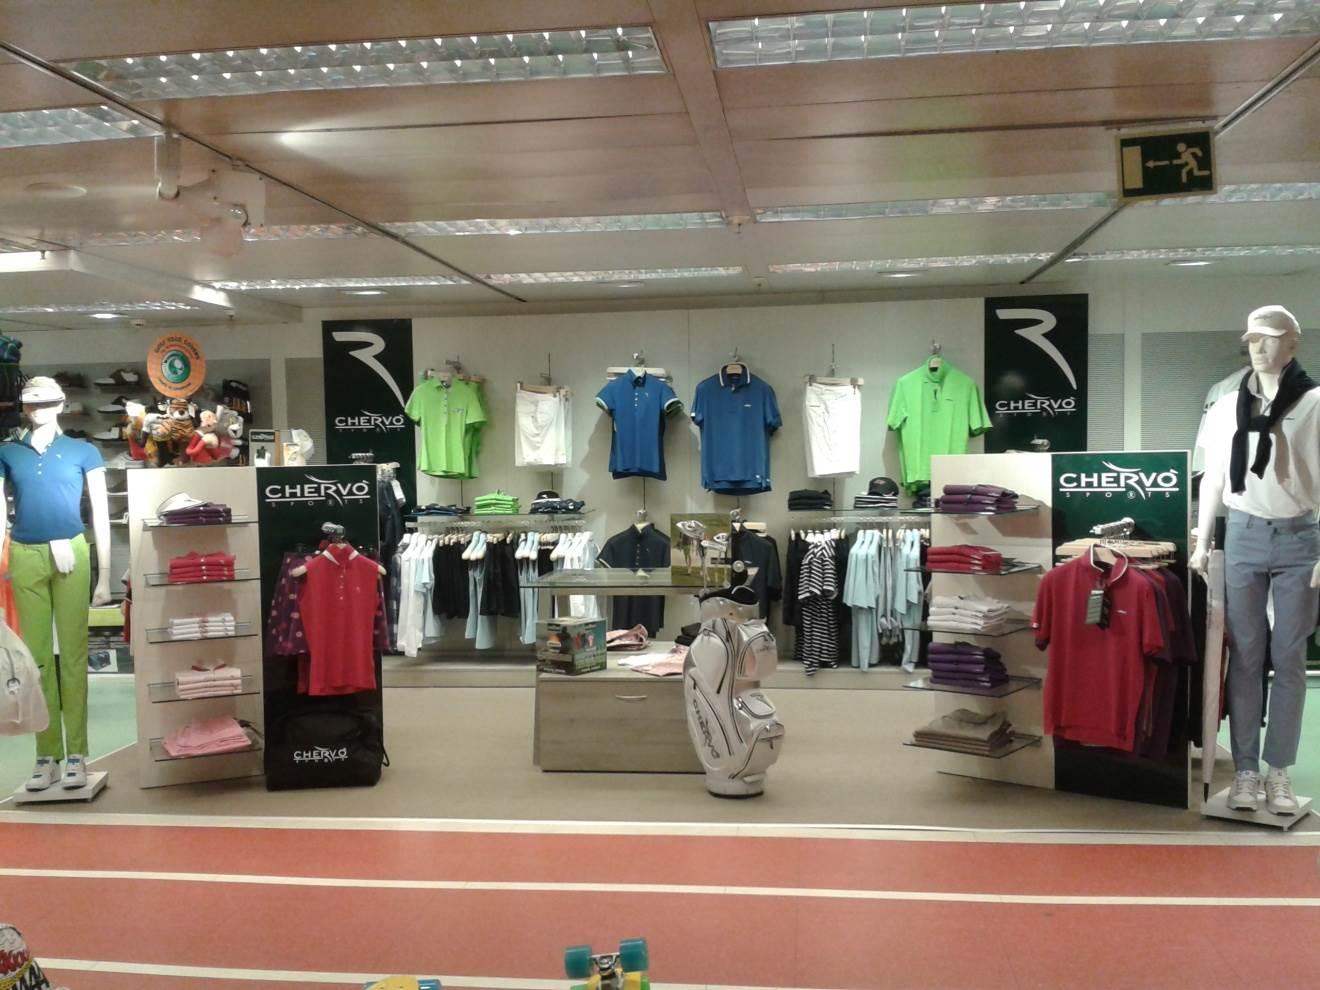 cd3bee6418ce tienda-chervo-el-corte-inglés-pozuelo   Carser Sports